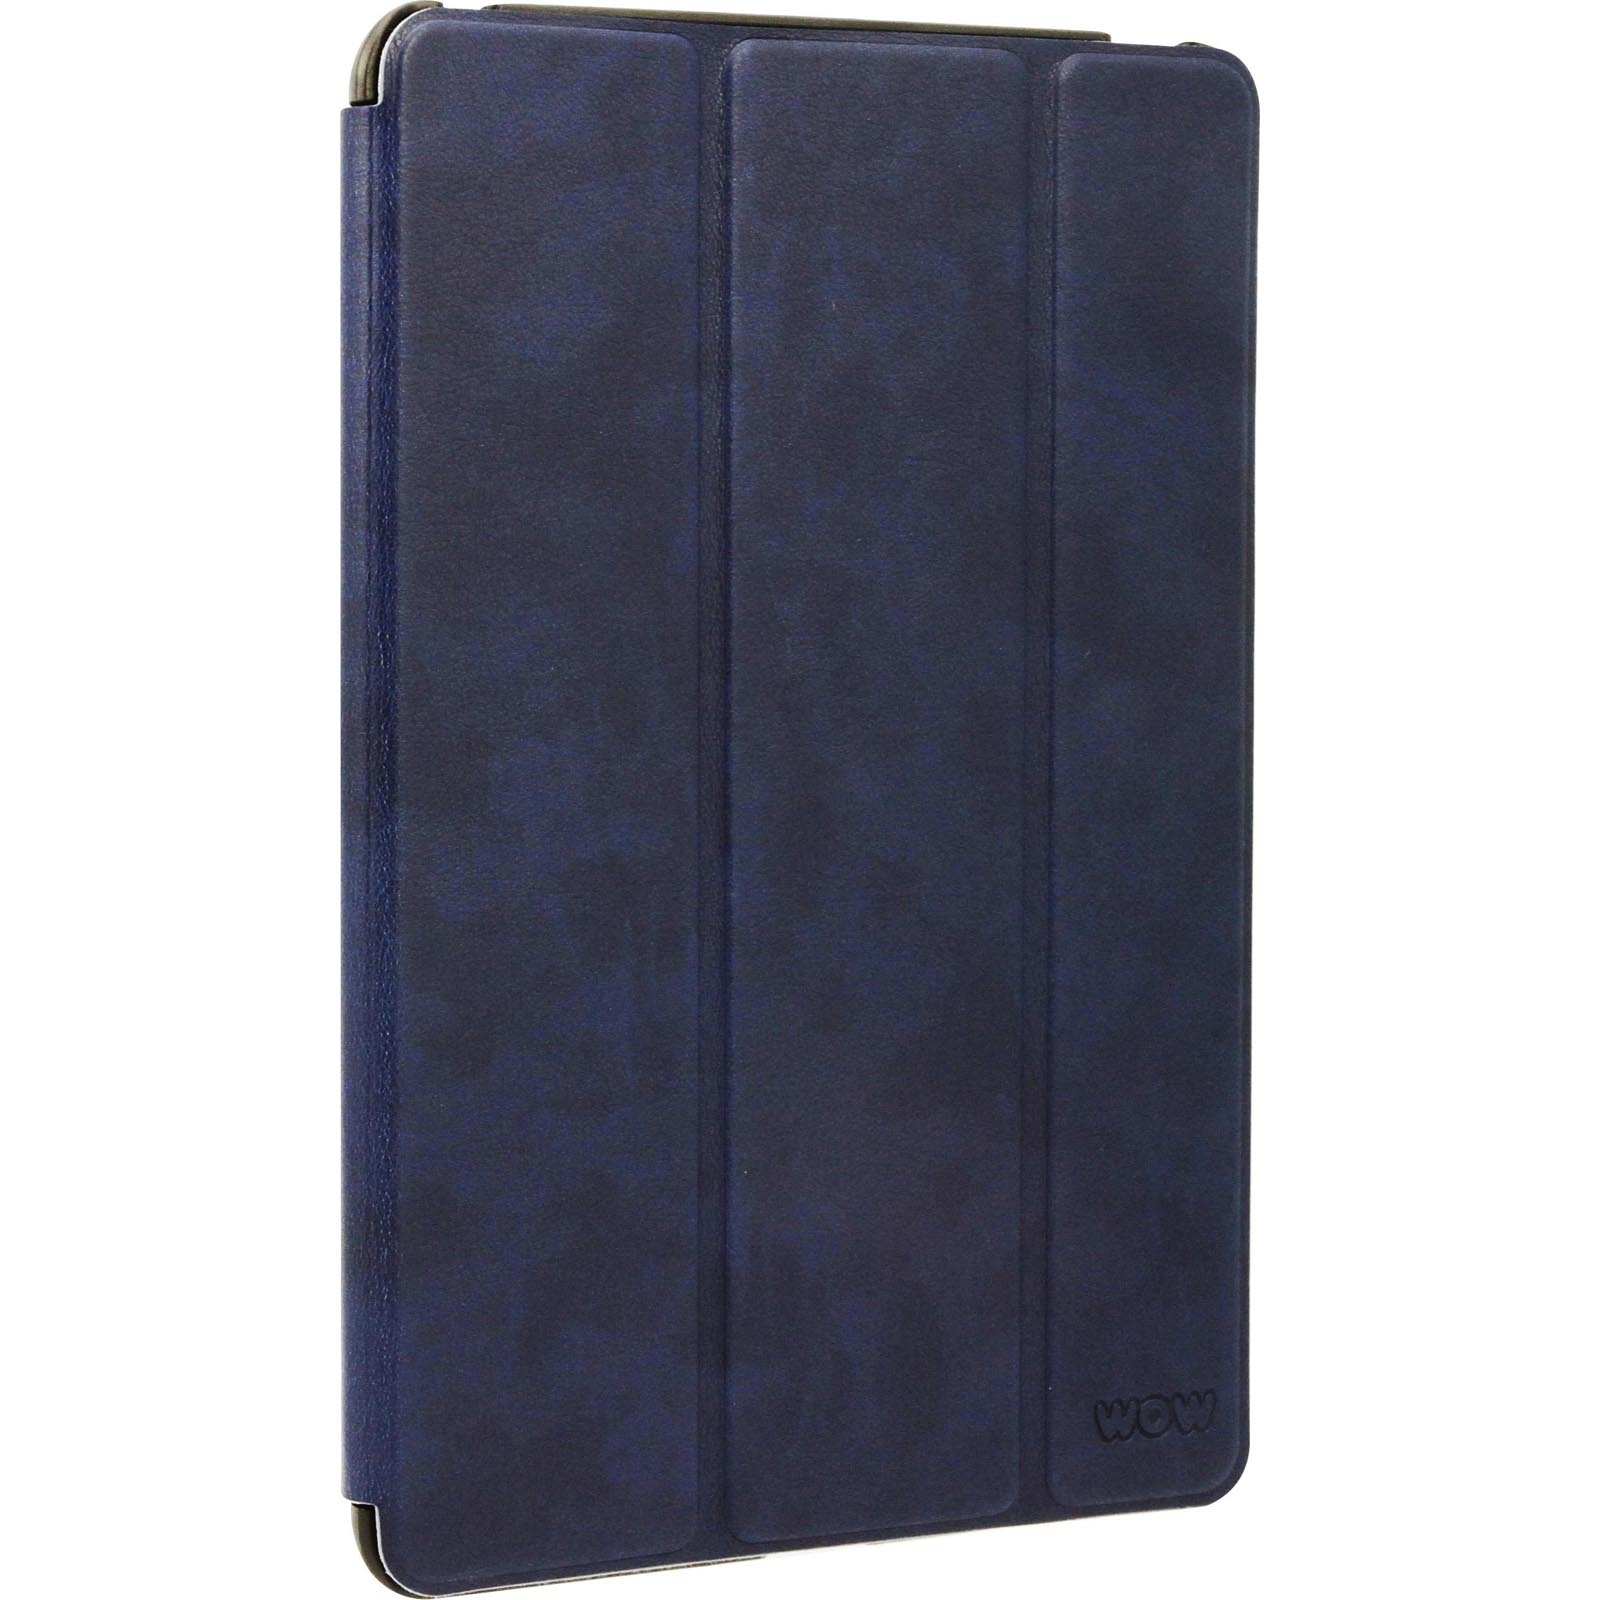 WOW Protective Case for iPad Mini - Blue